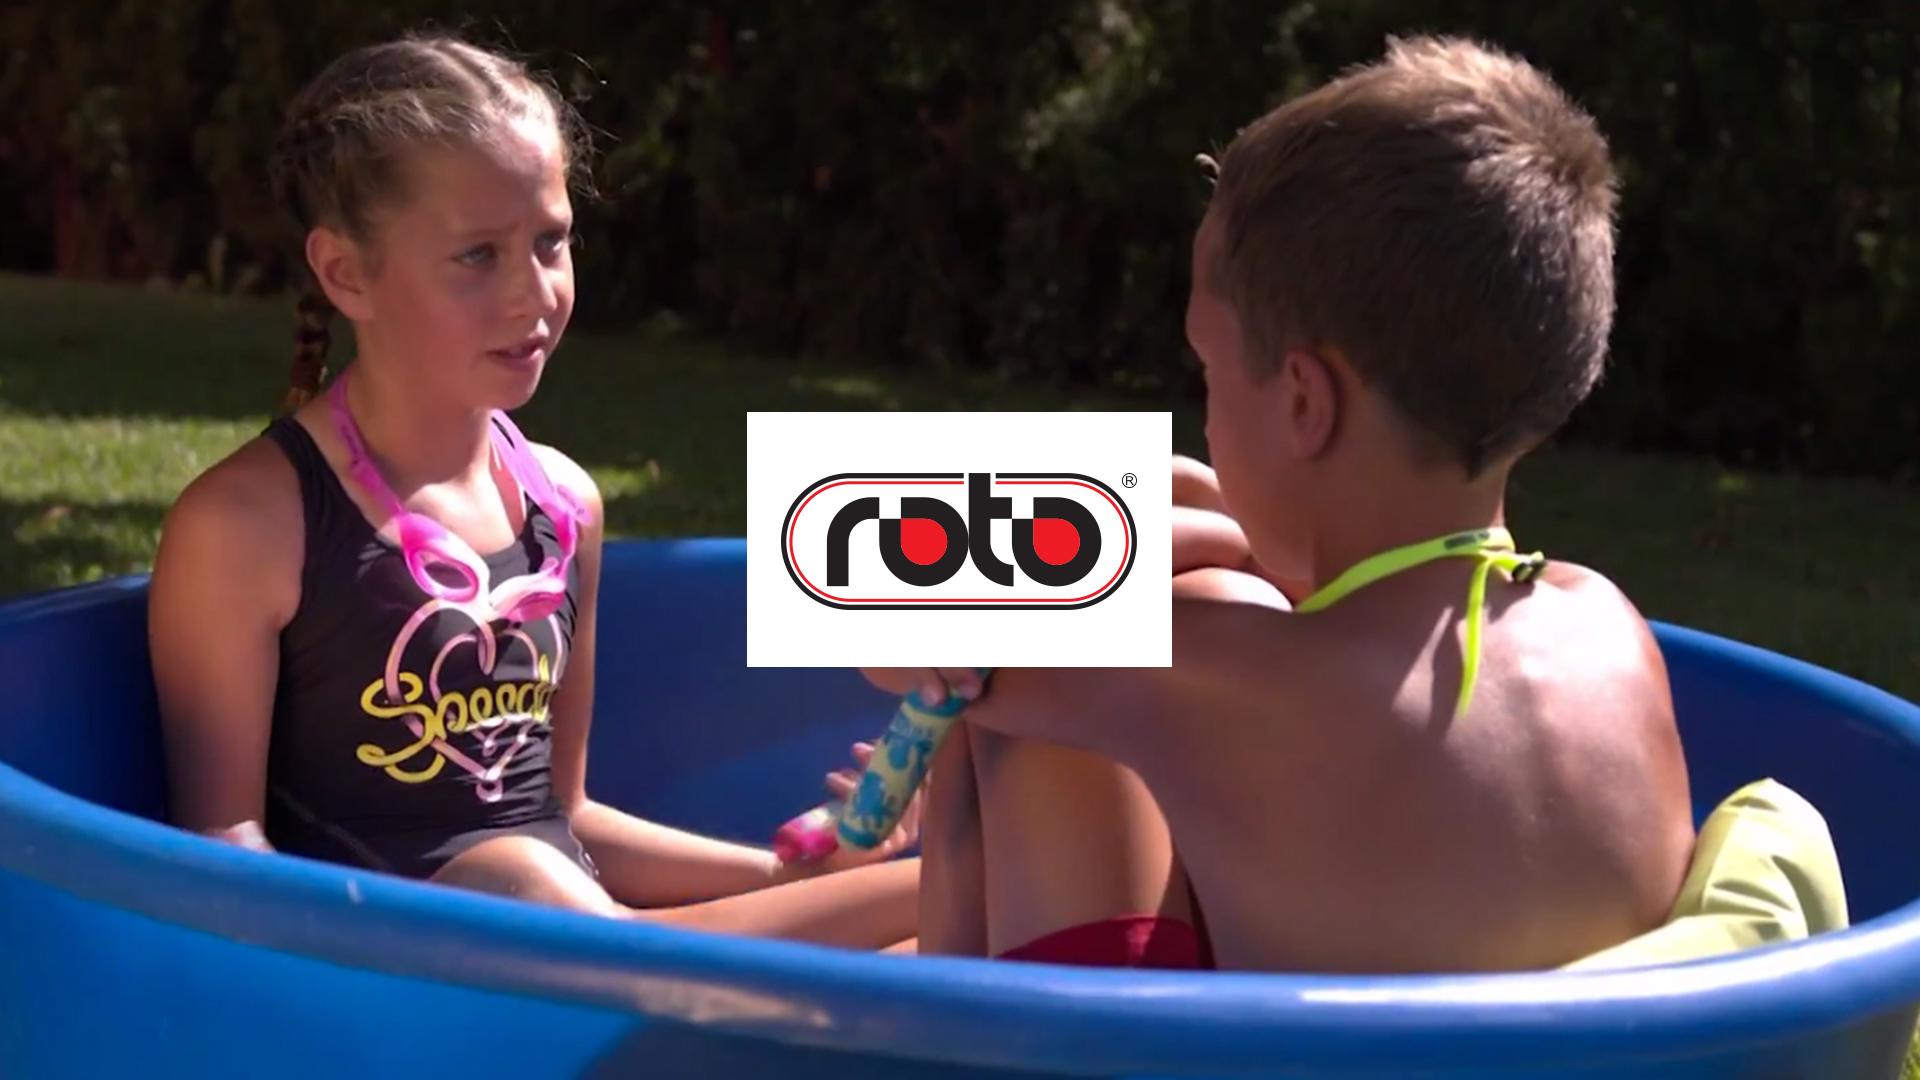 Spot_Roto.jpg